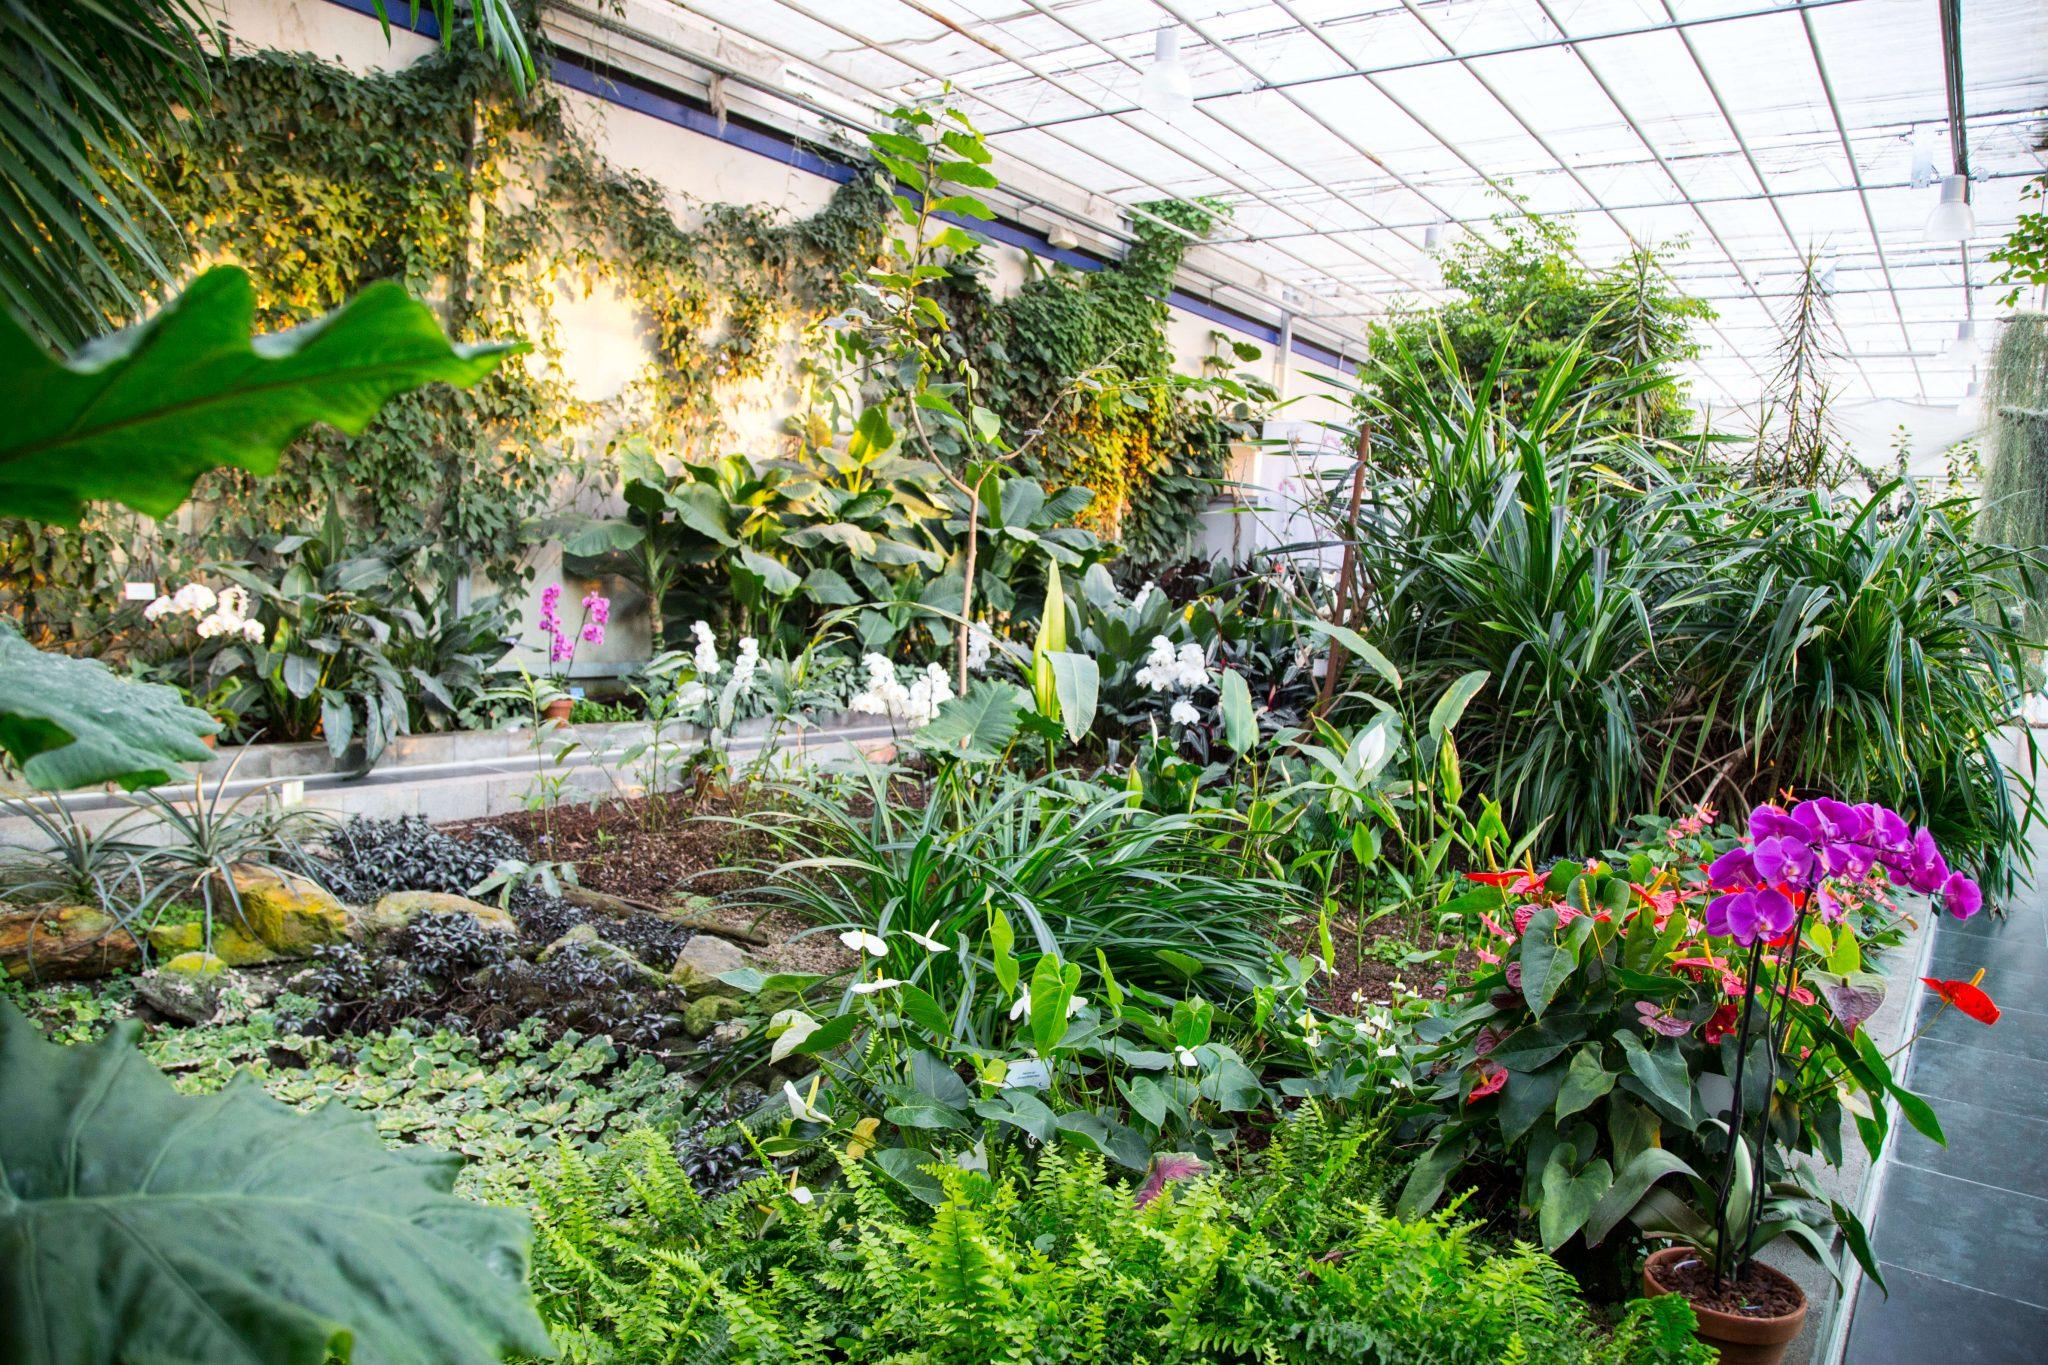 Blaue Orchideen, Ocean Orchids, Orchideen, Slowenien, Dobrovnik, Foto Anita Arneitz, Reiseblog www.anitaaufreisen.at